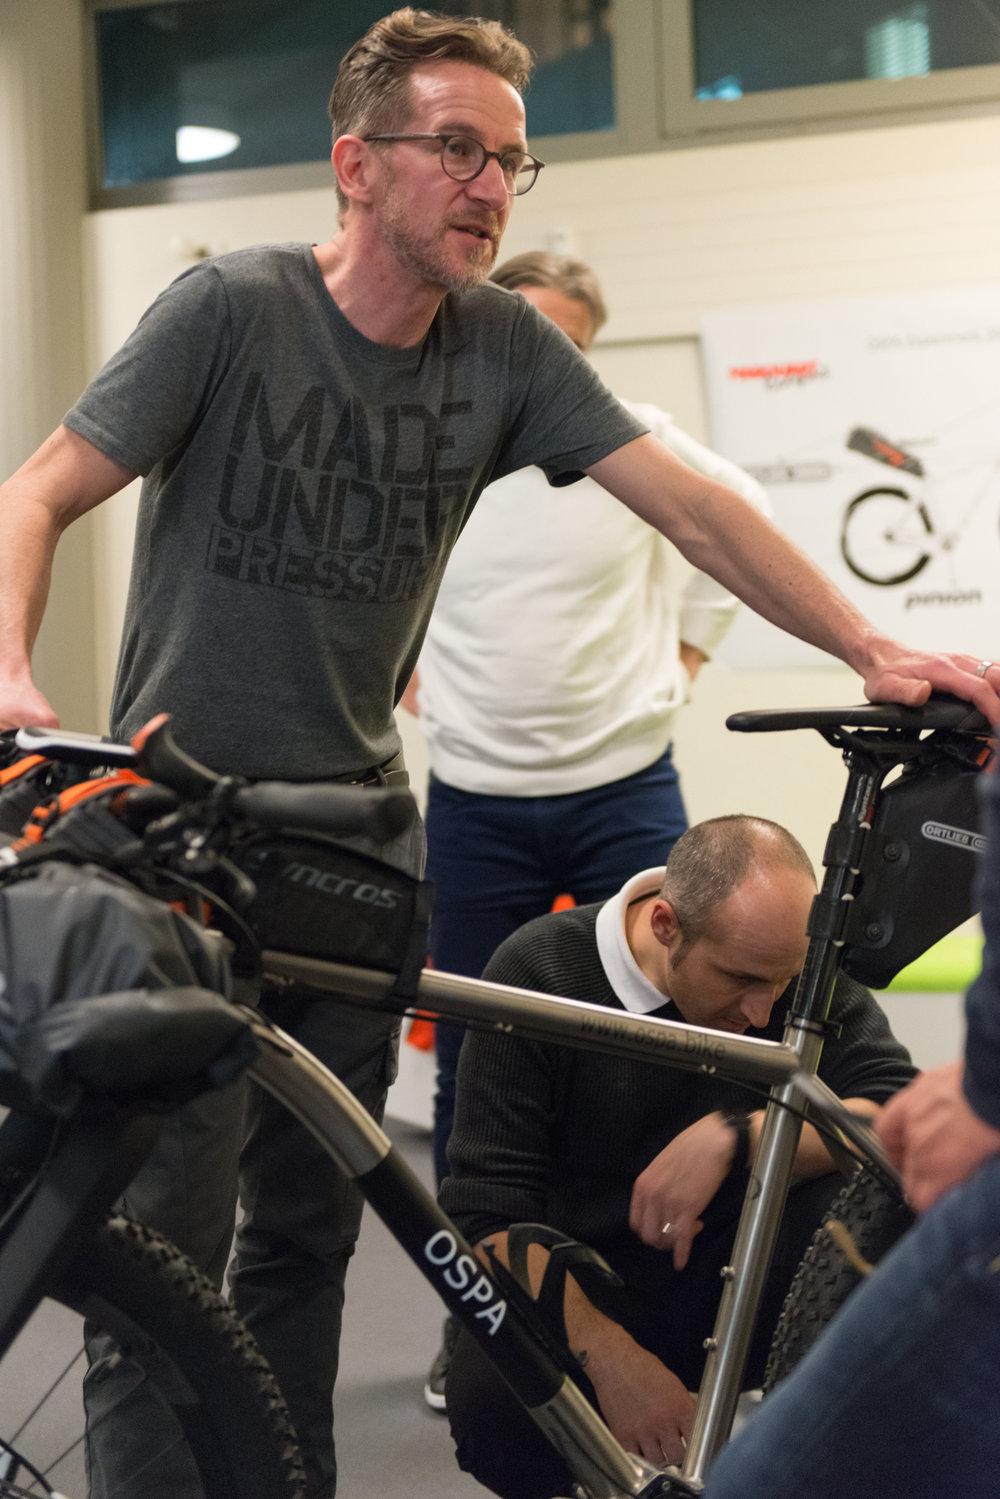 OSPA Bike Präsentation - 07.jpg